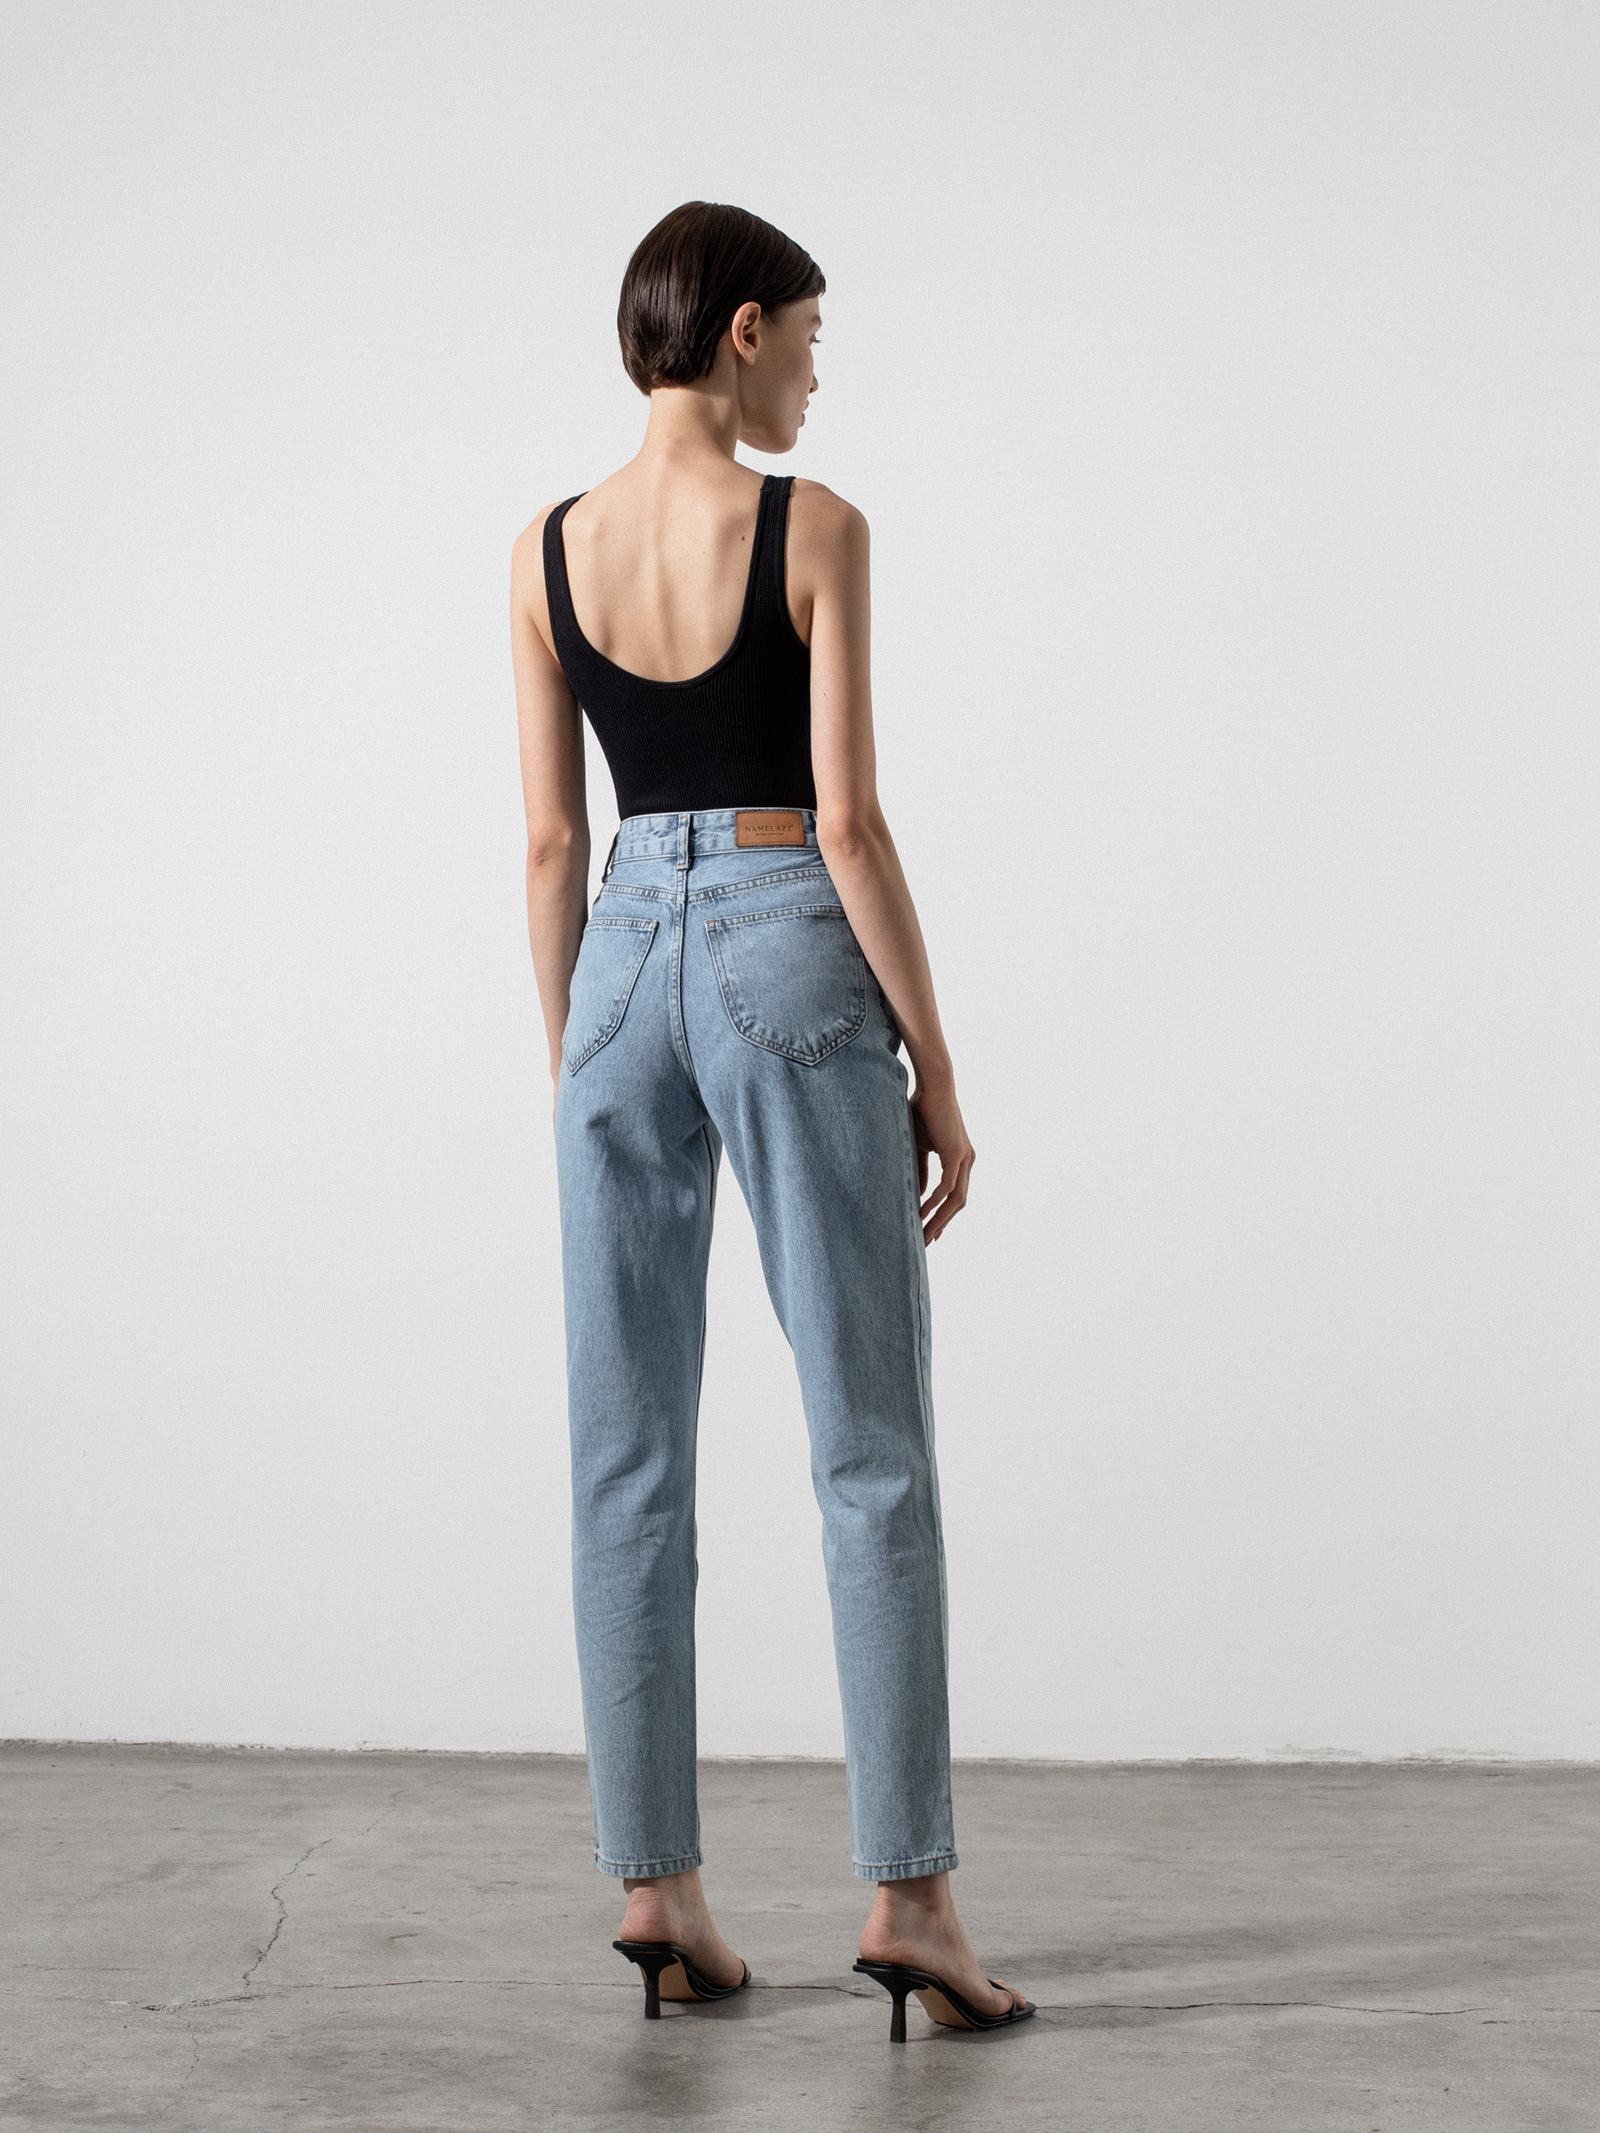 jinglers джинсы официальный сайт